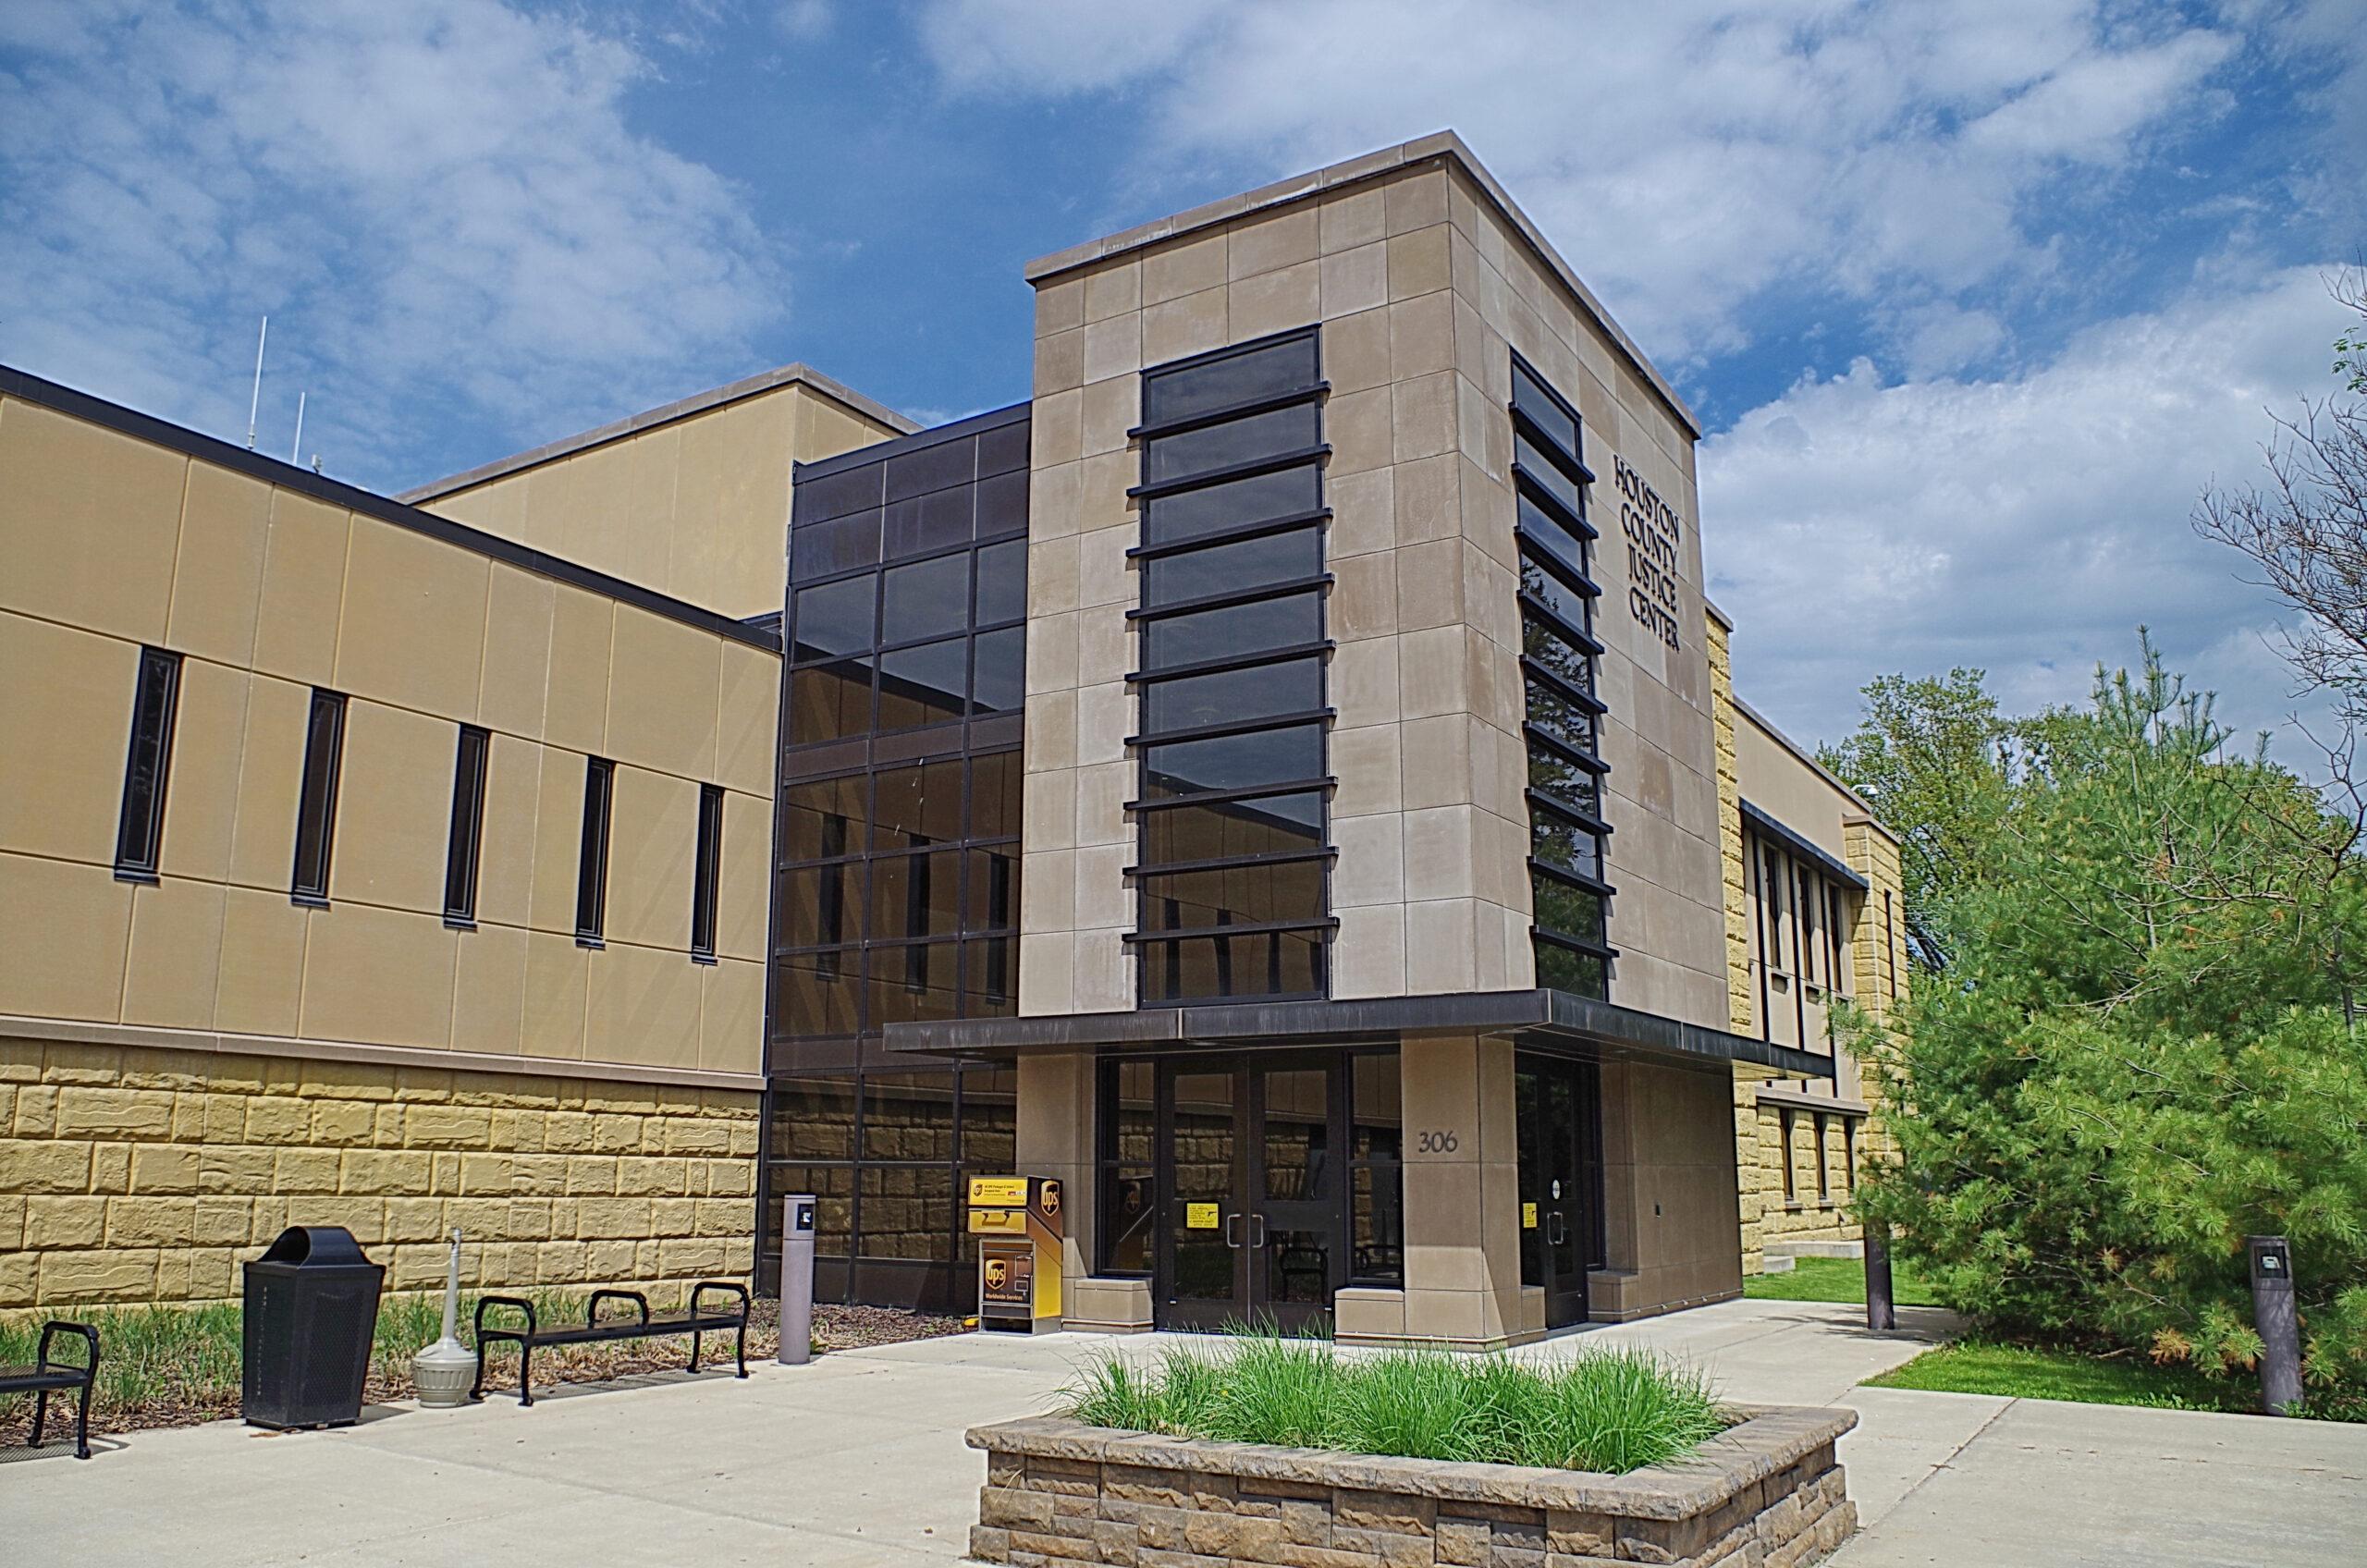 Houston County   Us Courthouses regarding Court Calendar For Washington County Minnesota